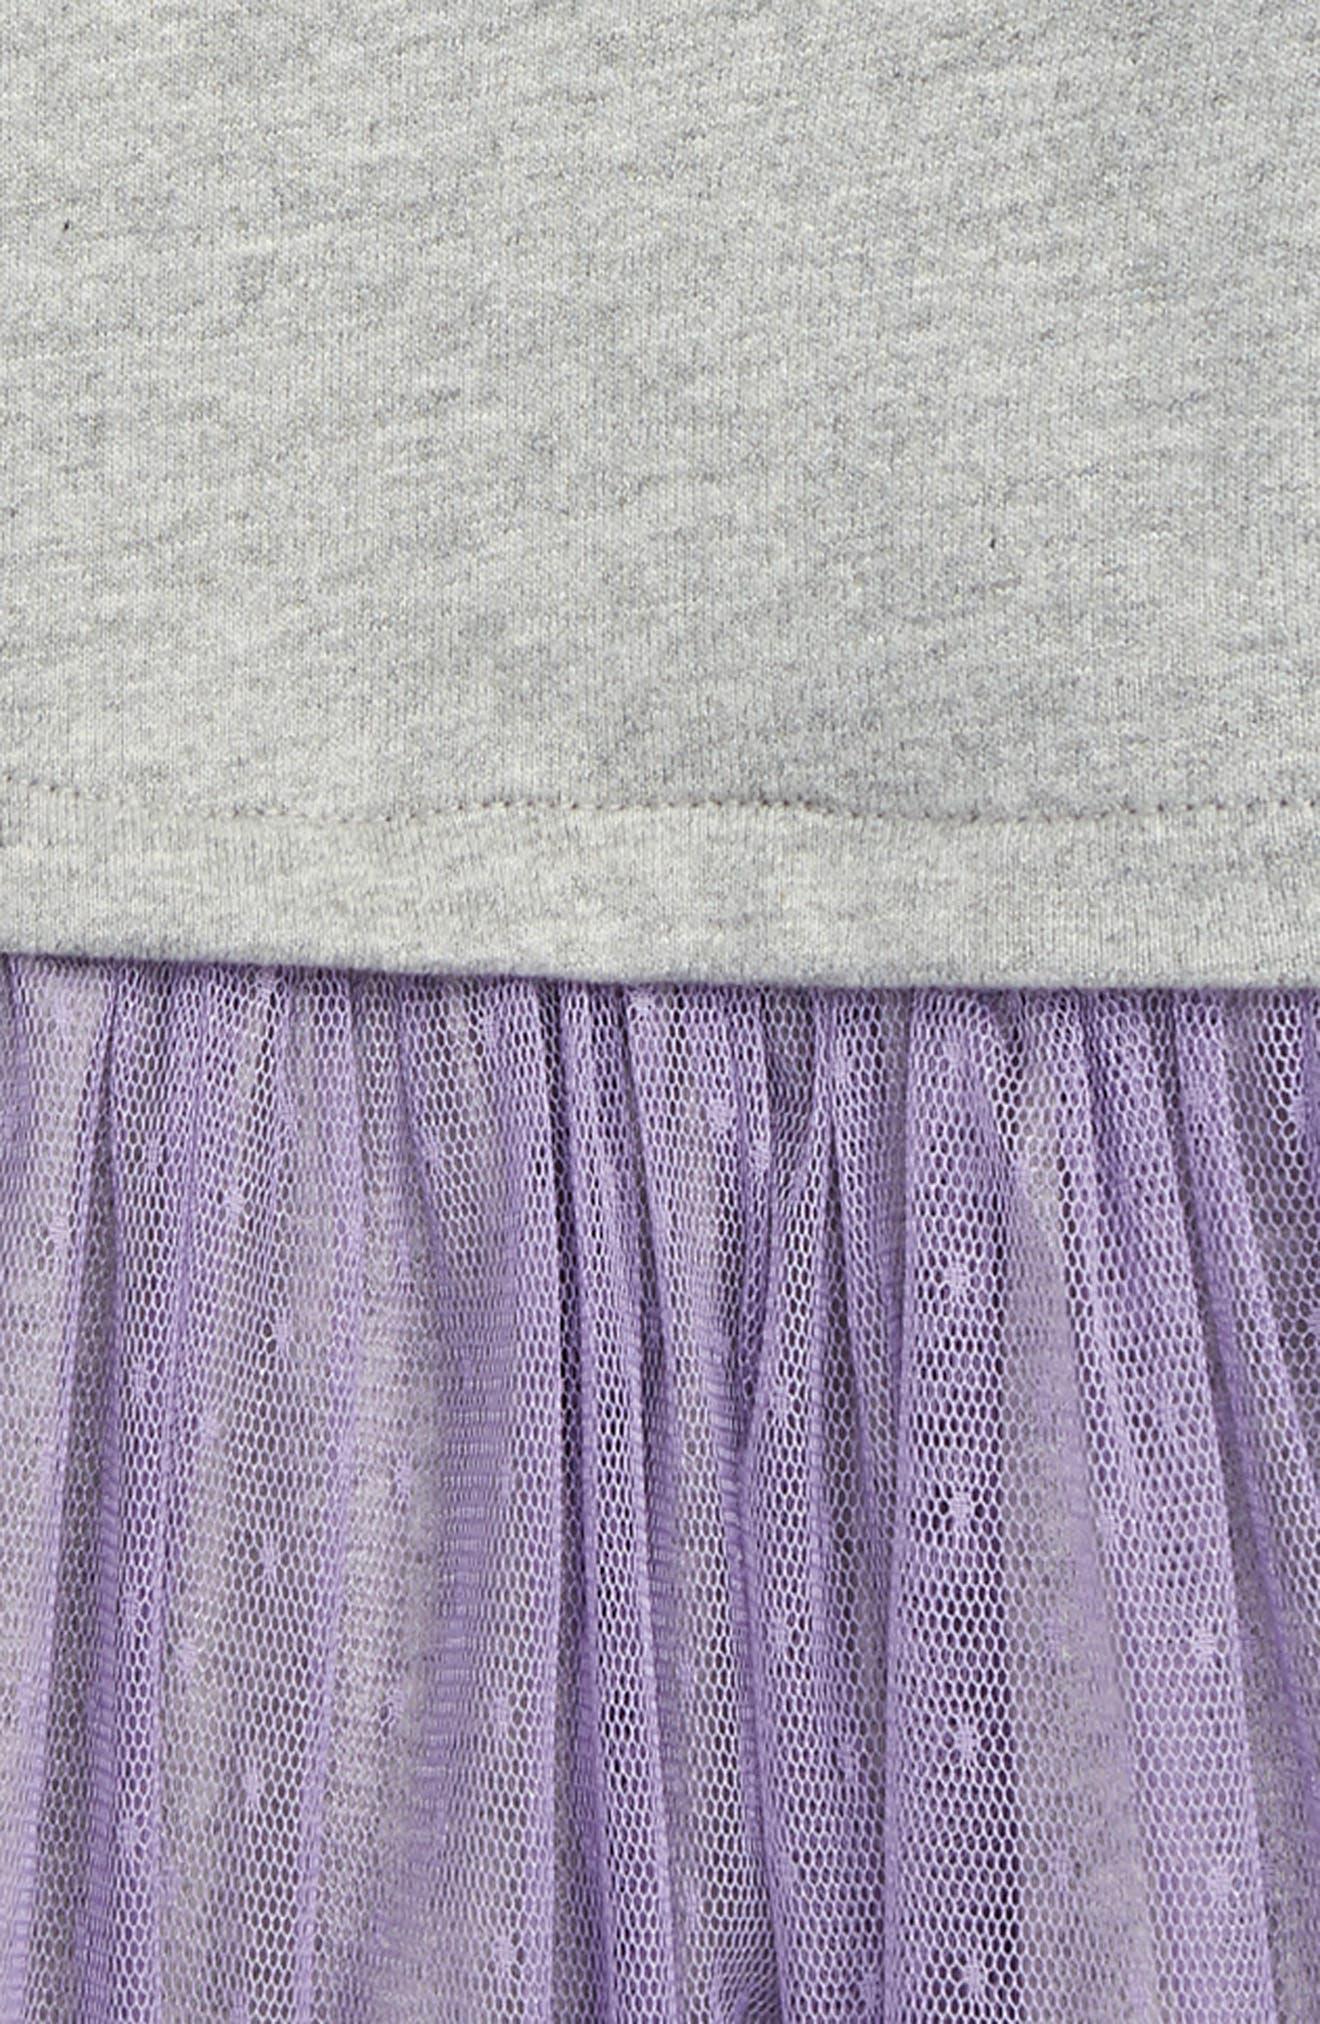 Tulle Skirted Dress,                             Alternate thumbnail 2, color,                             Med Heather Grey